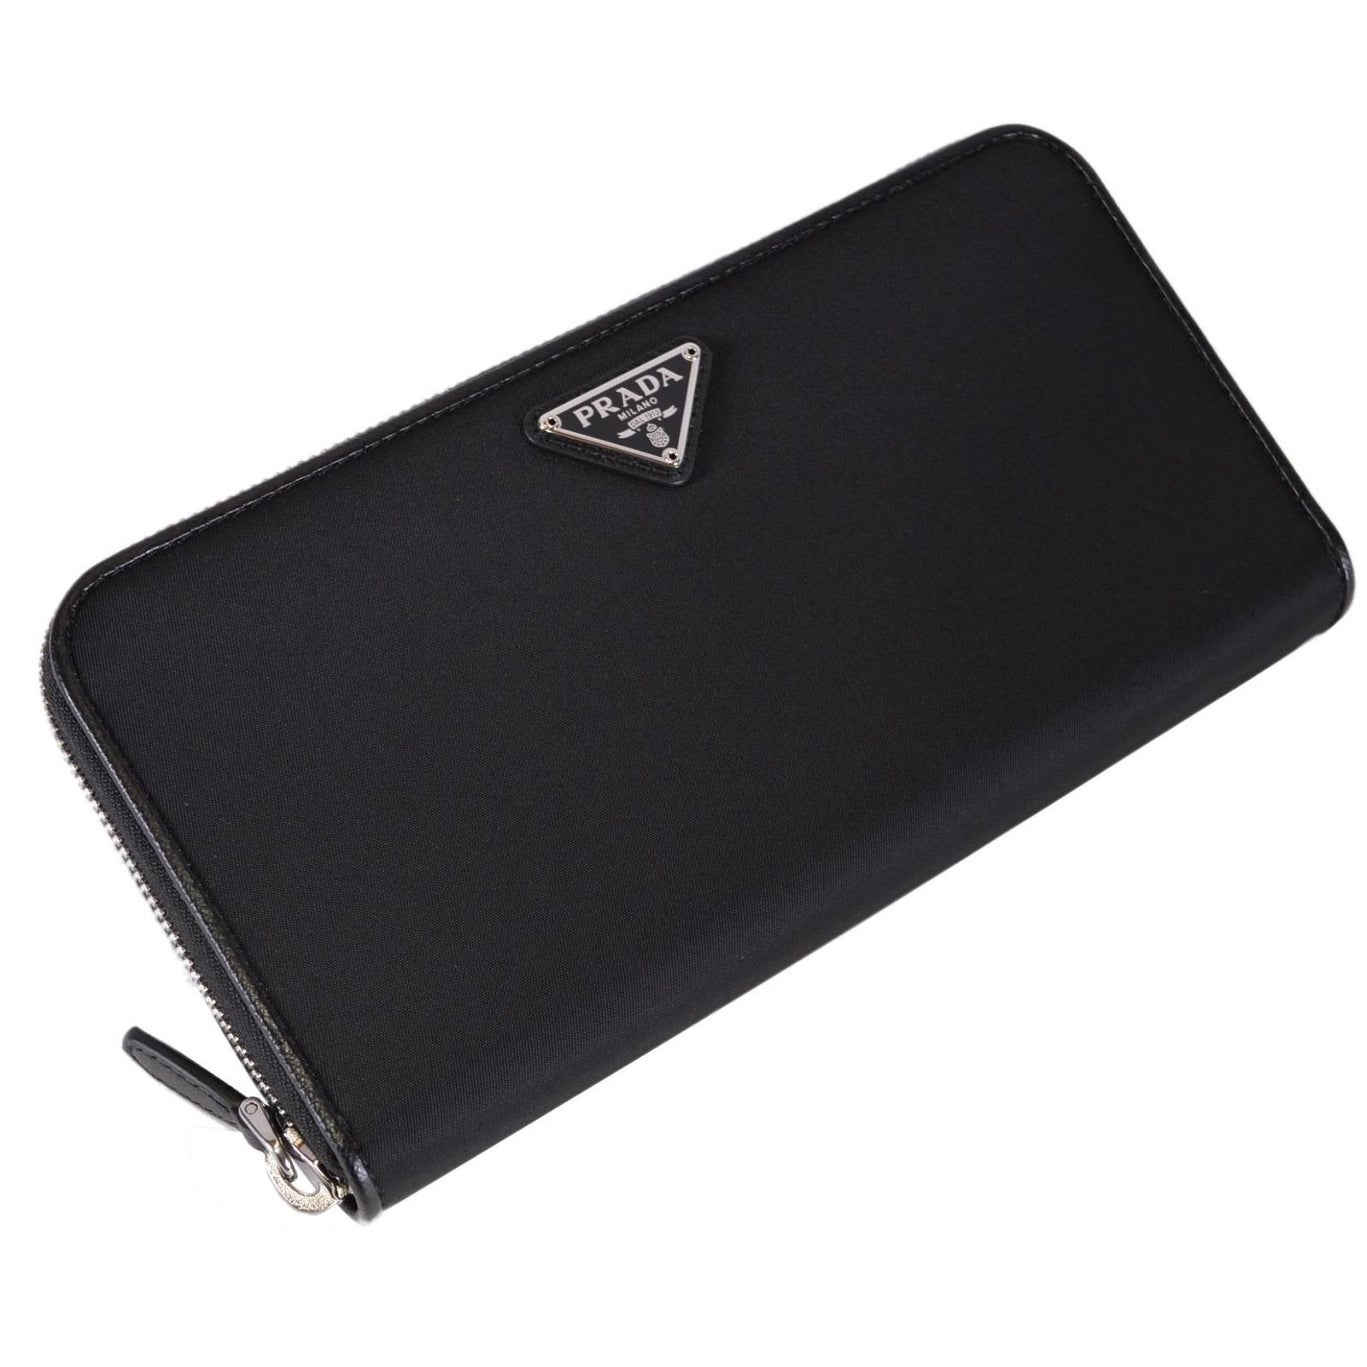 8c9740696891b2 Shop Prada Women's 1ML506 UZO Black Nylon Zip Around Wallet Clutch - 8